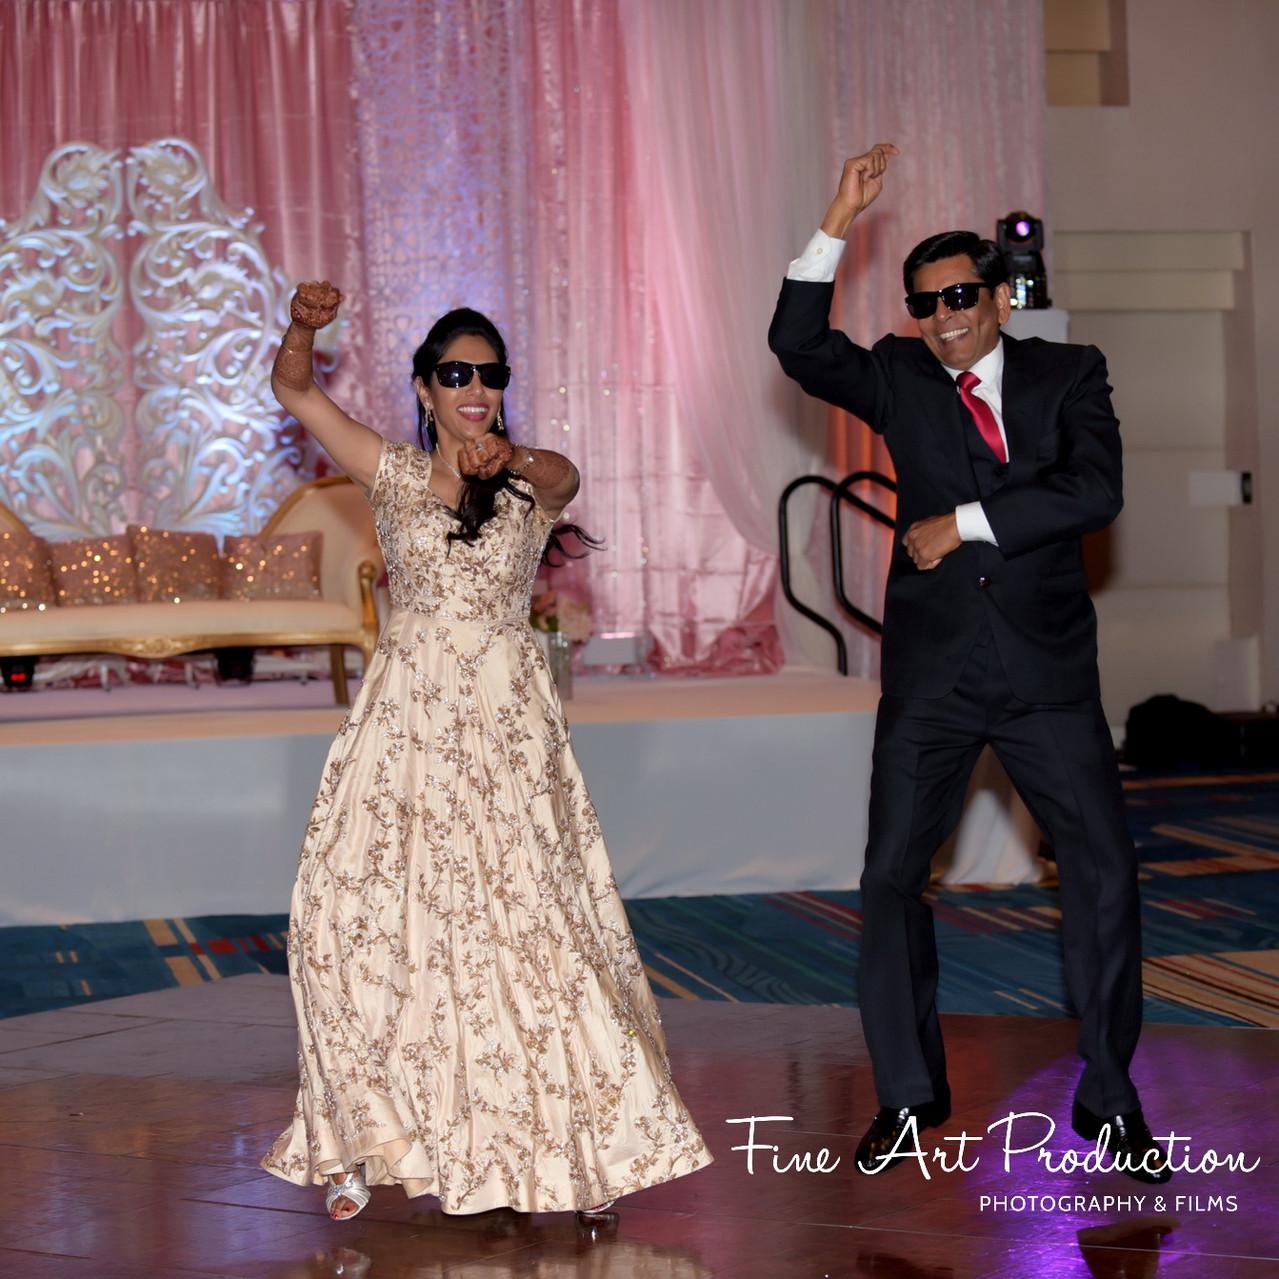 Hyatt-Regency-Grand-Cypress-Indian-Wedding-Reception-Photography-Fine-Art-Production-Amish-Thakkar_29